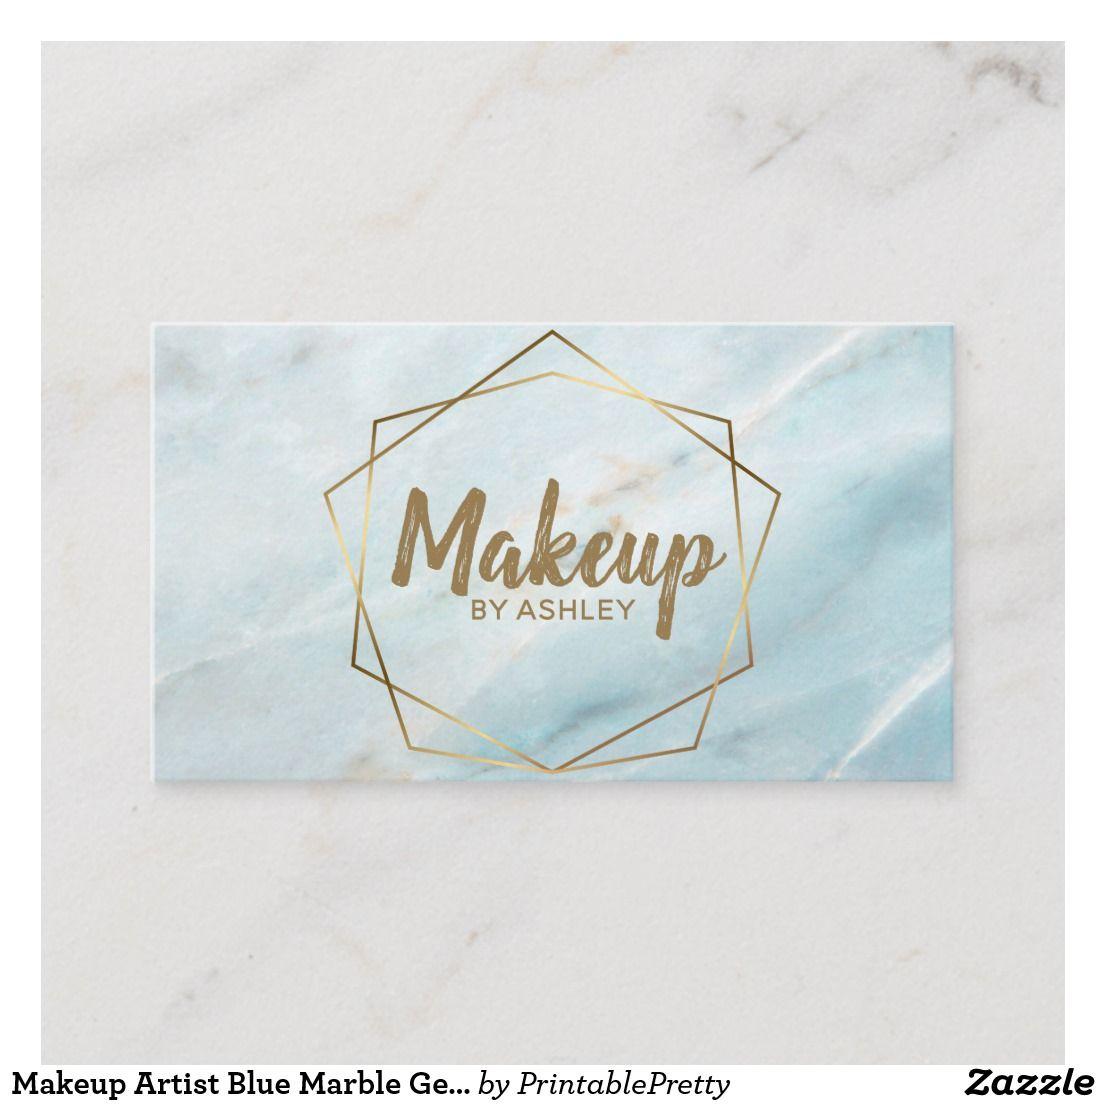 Makeup Artist Blue Marble Geometric Terrarium Business Card Zazzle Com Business Cards Beauty Glitter Business Cards Makeup Artist Business Cards